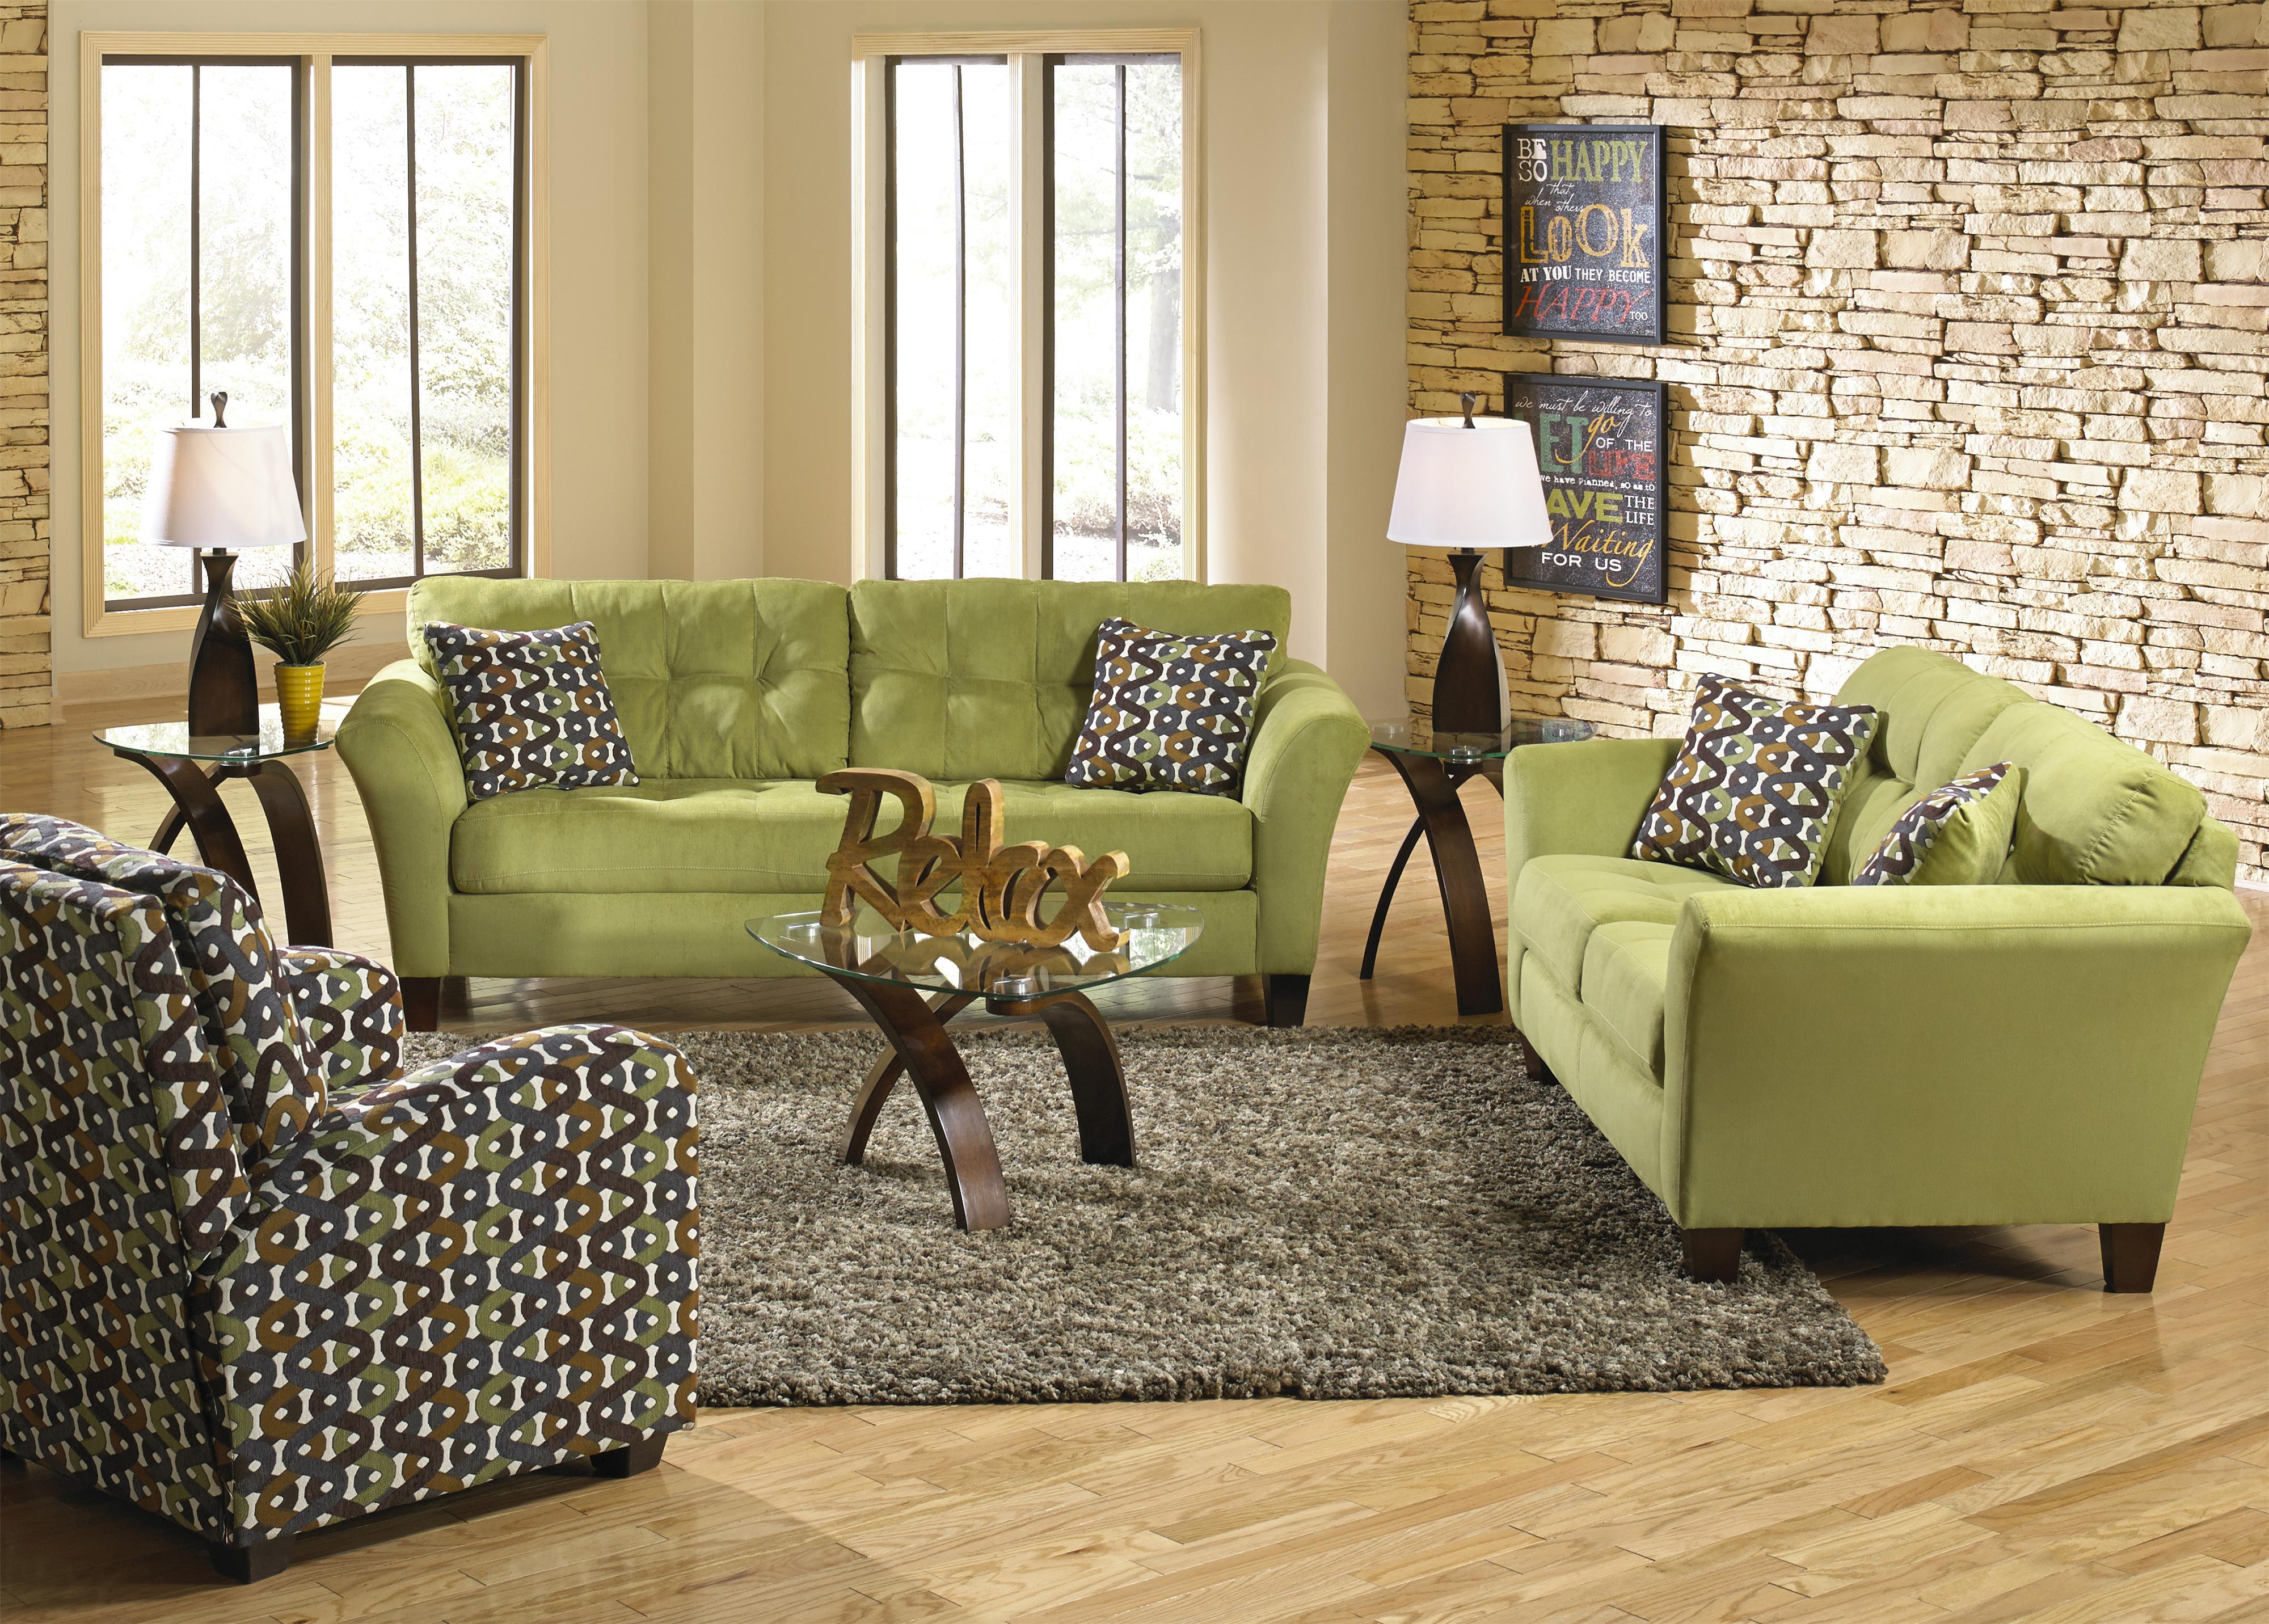 Jackson Furniture Halle Stationary Living Room Group - Item Number: 4381 Living Room Group 1